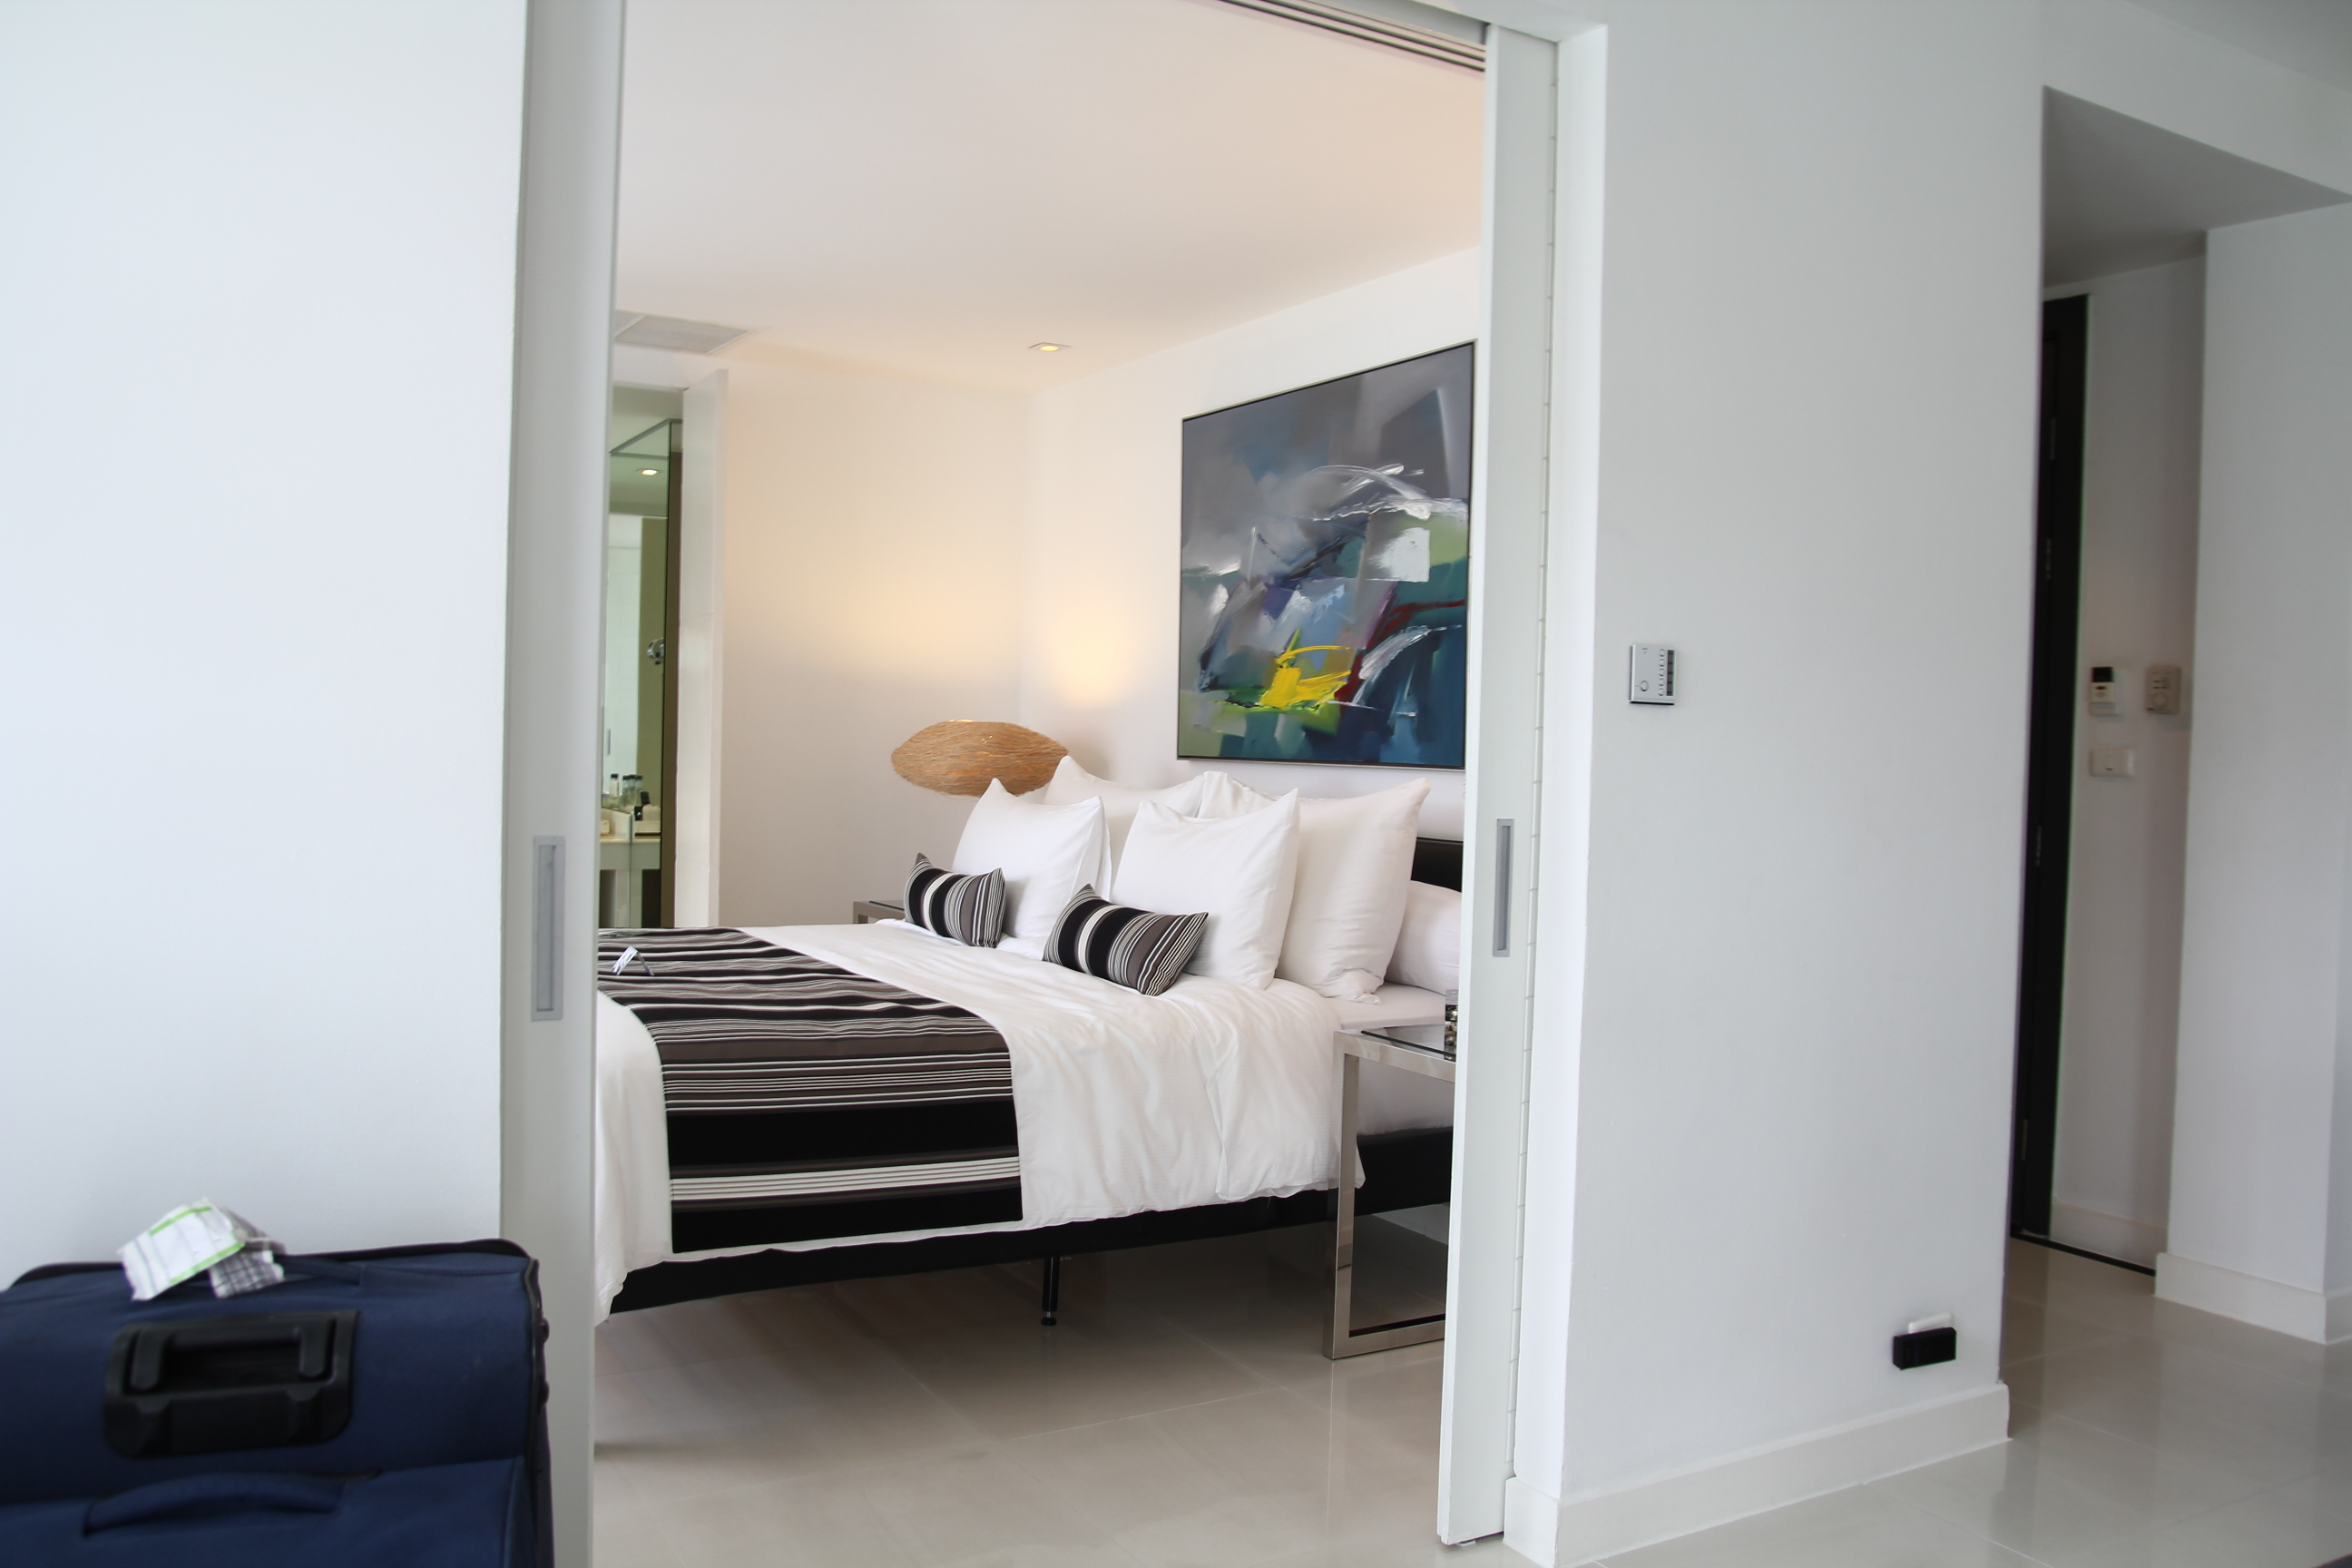 Bedroom BYD Lofts - Travelblog by Leslie Huhn